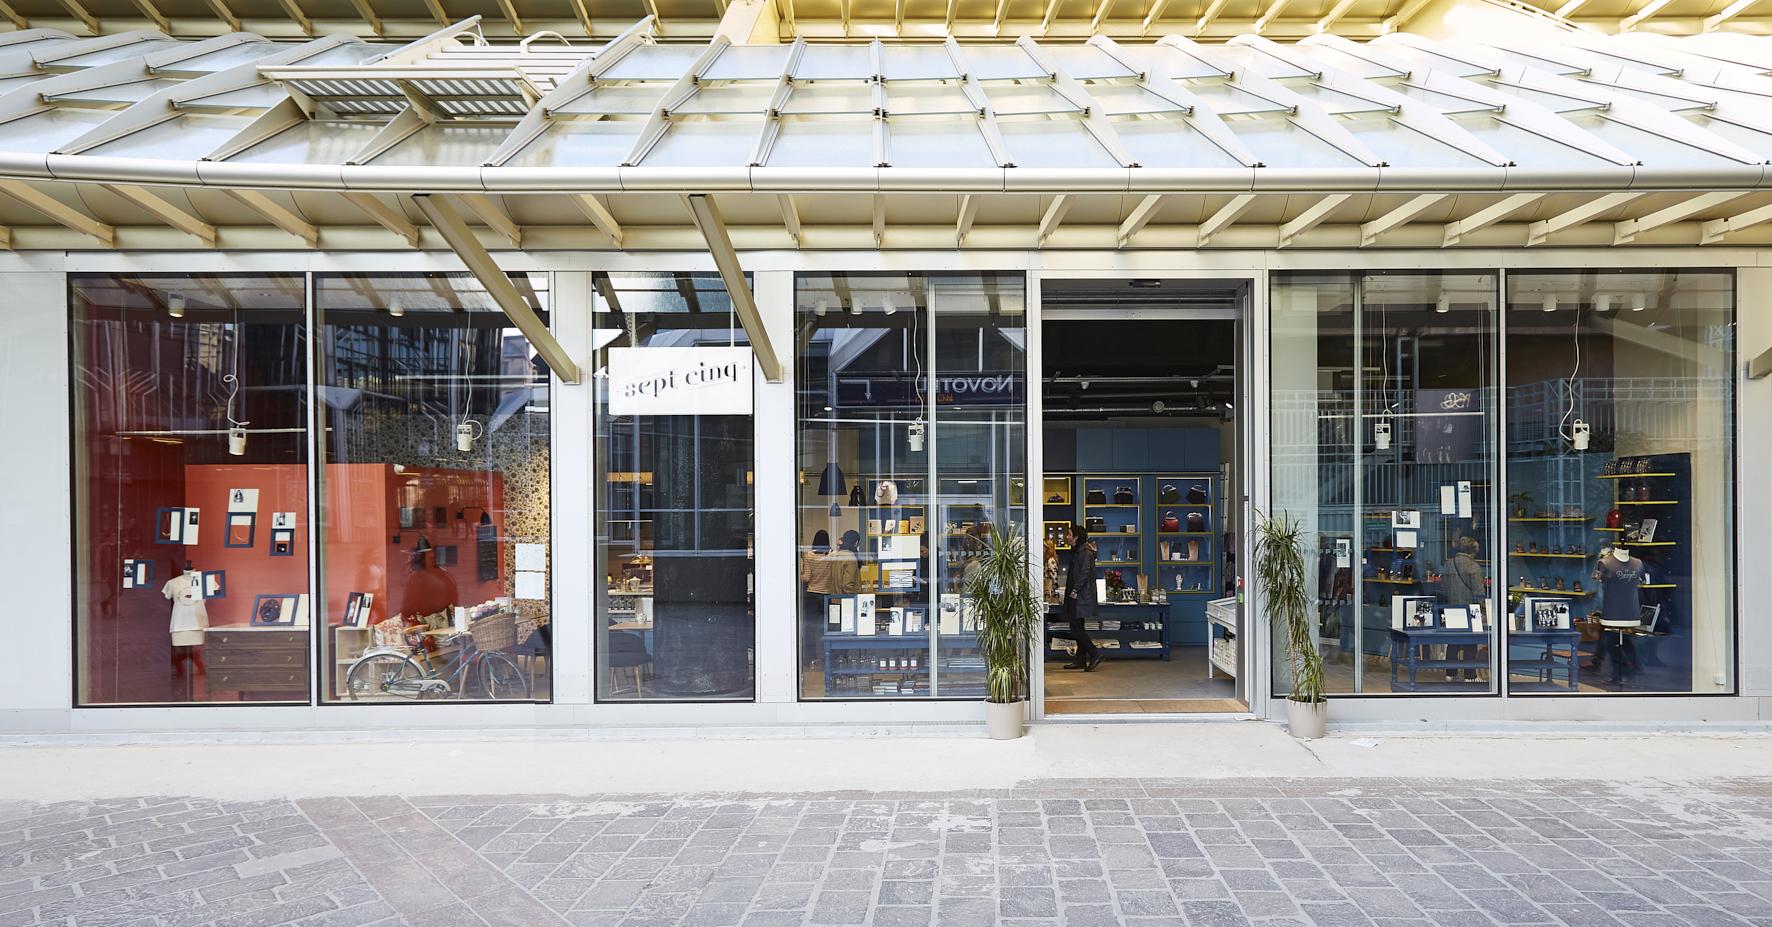 Boutique Sept-Cinq%252C Paris%252C 2016. G. Hermach